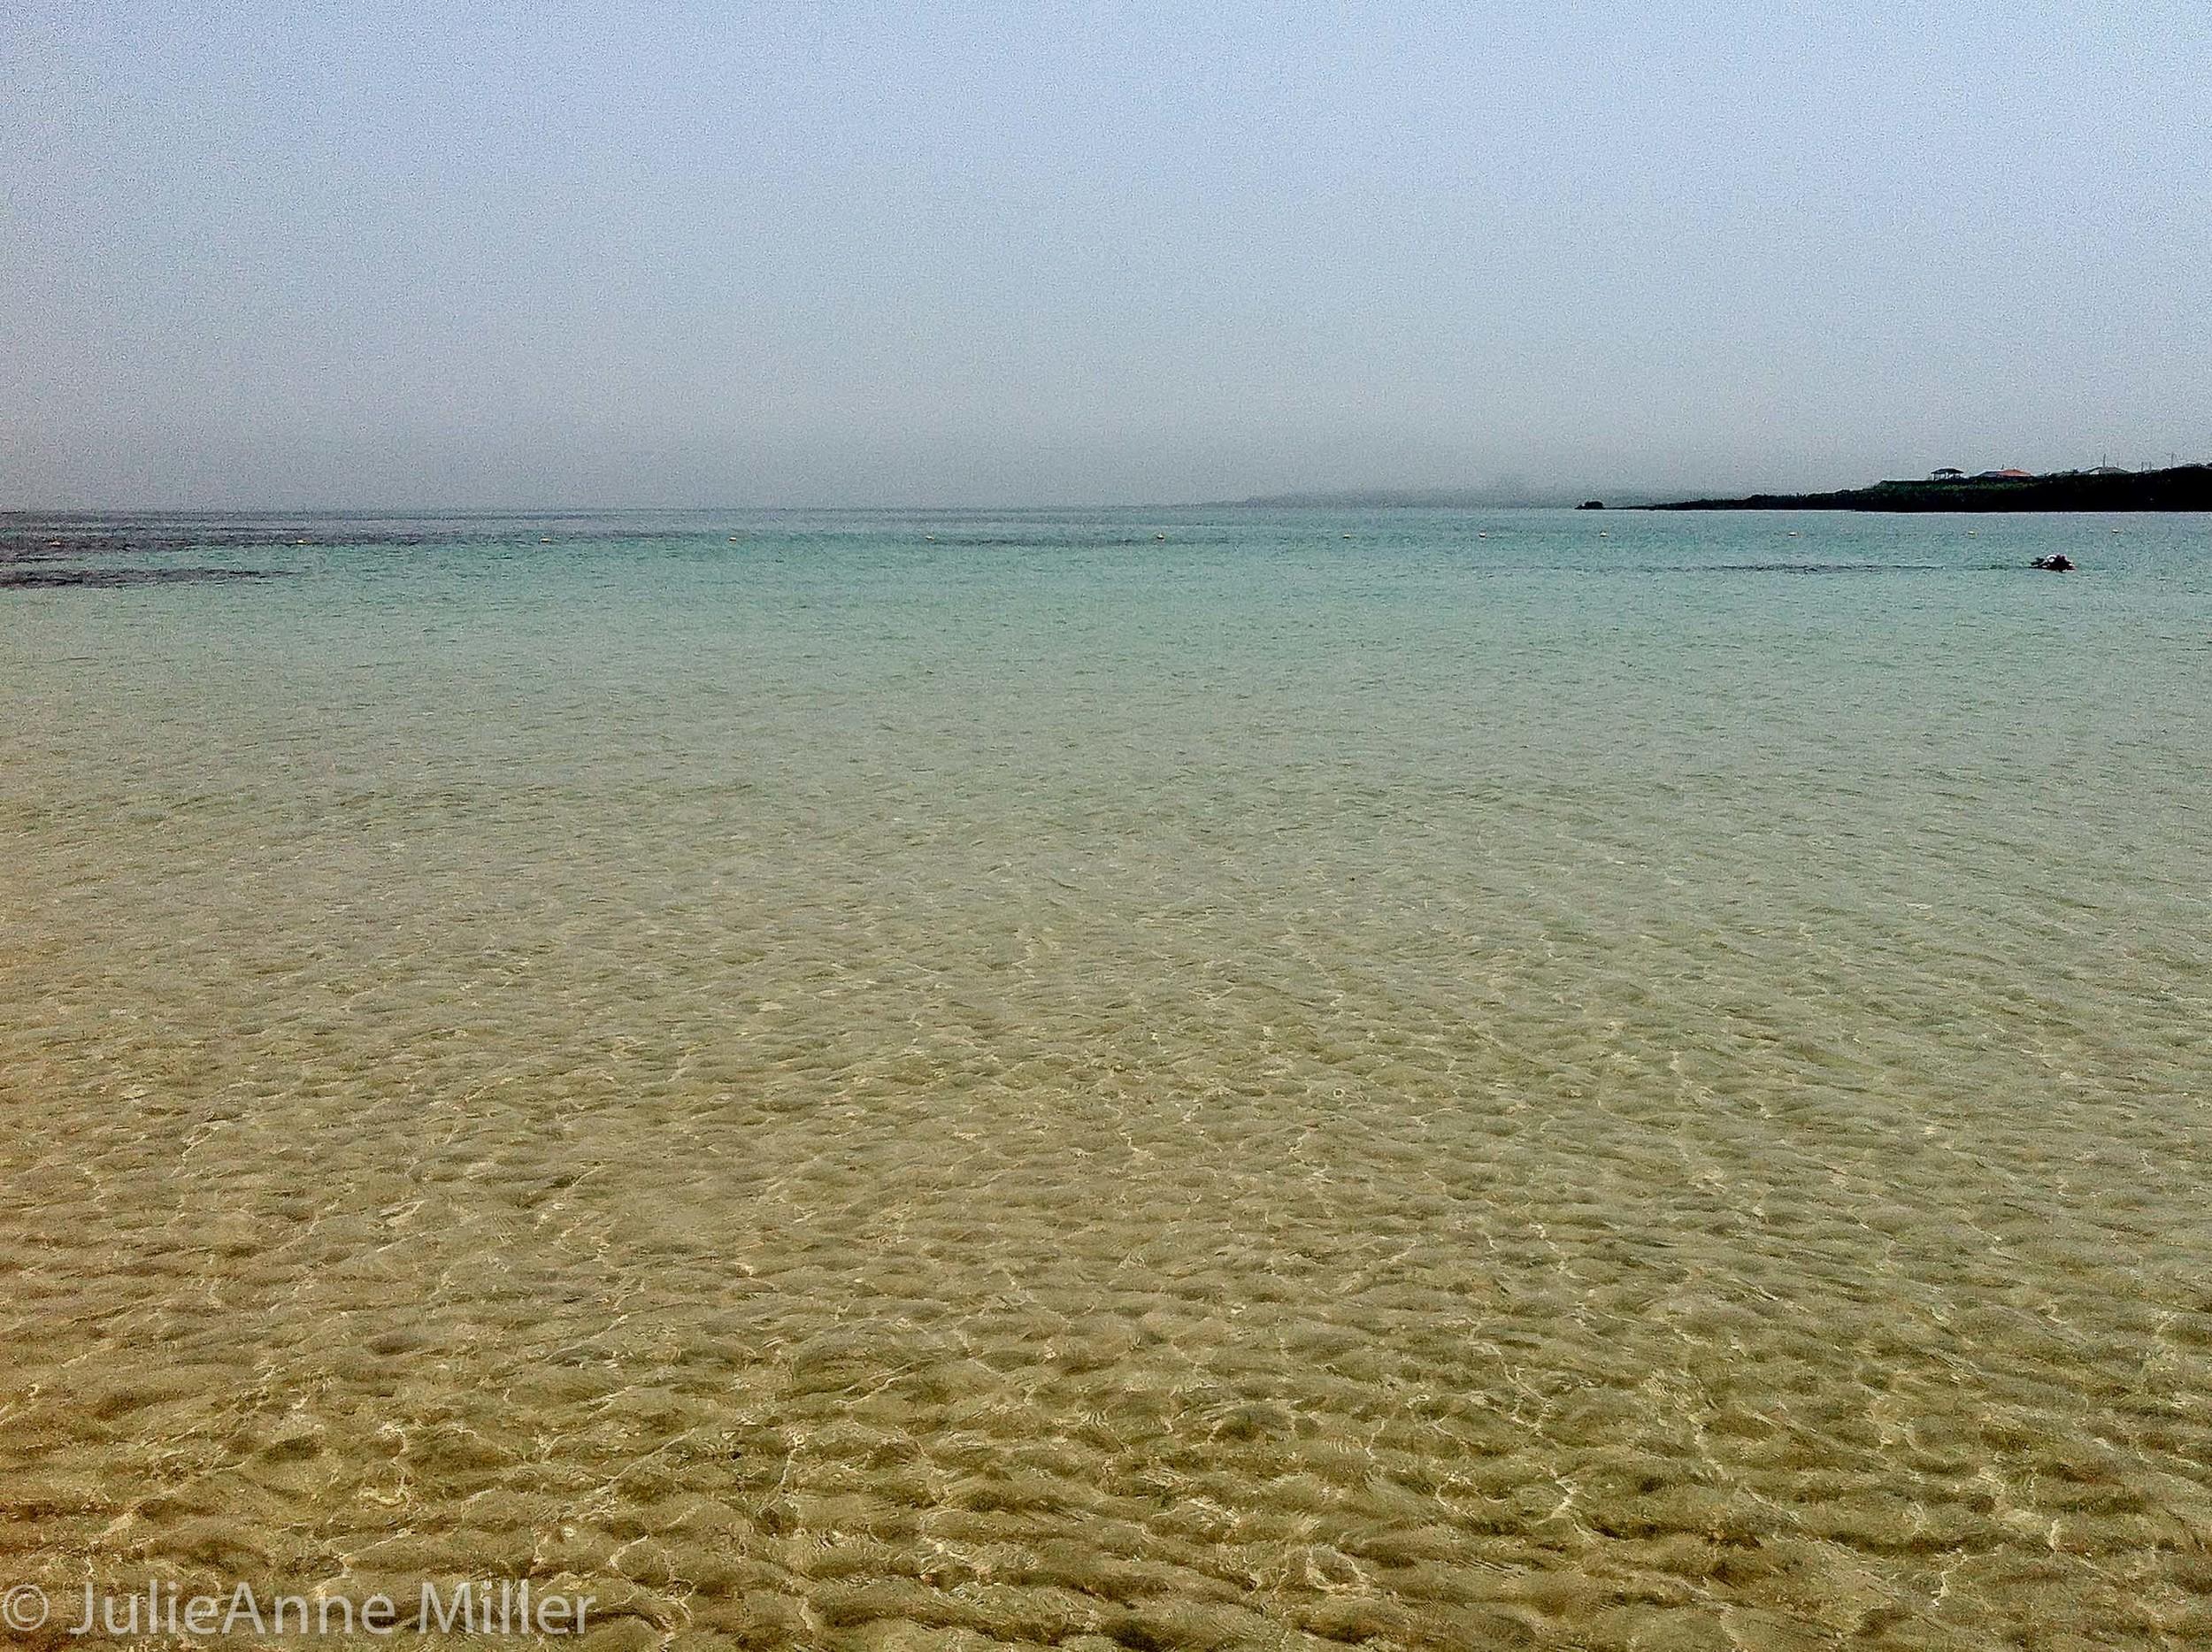 Hagosudong Beach